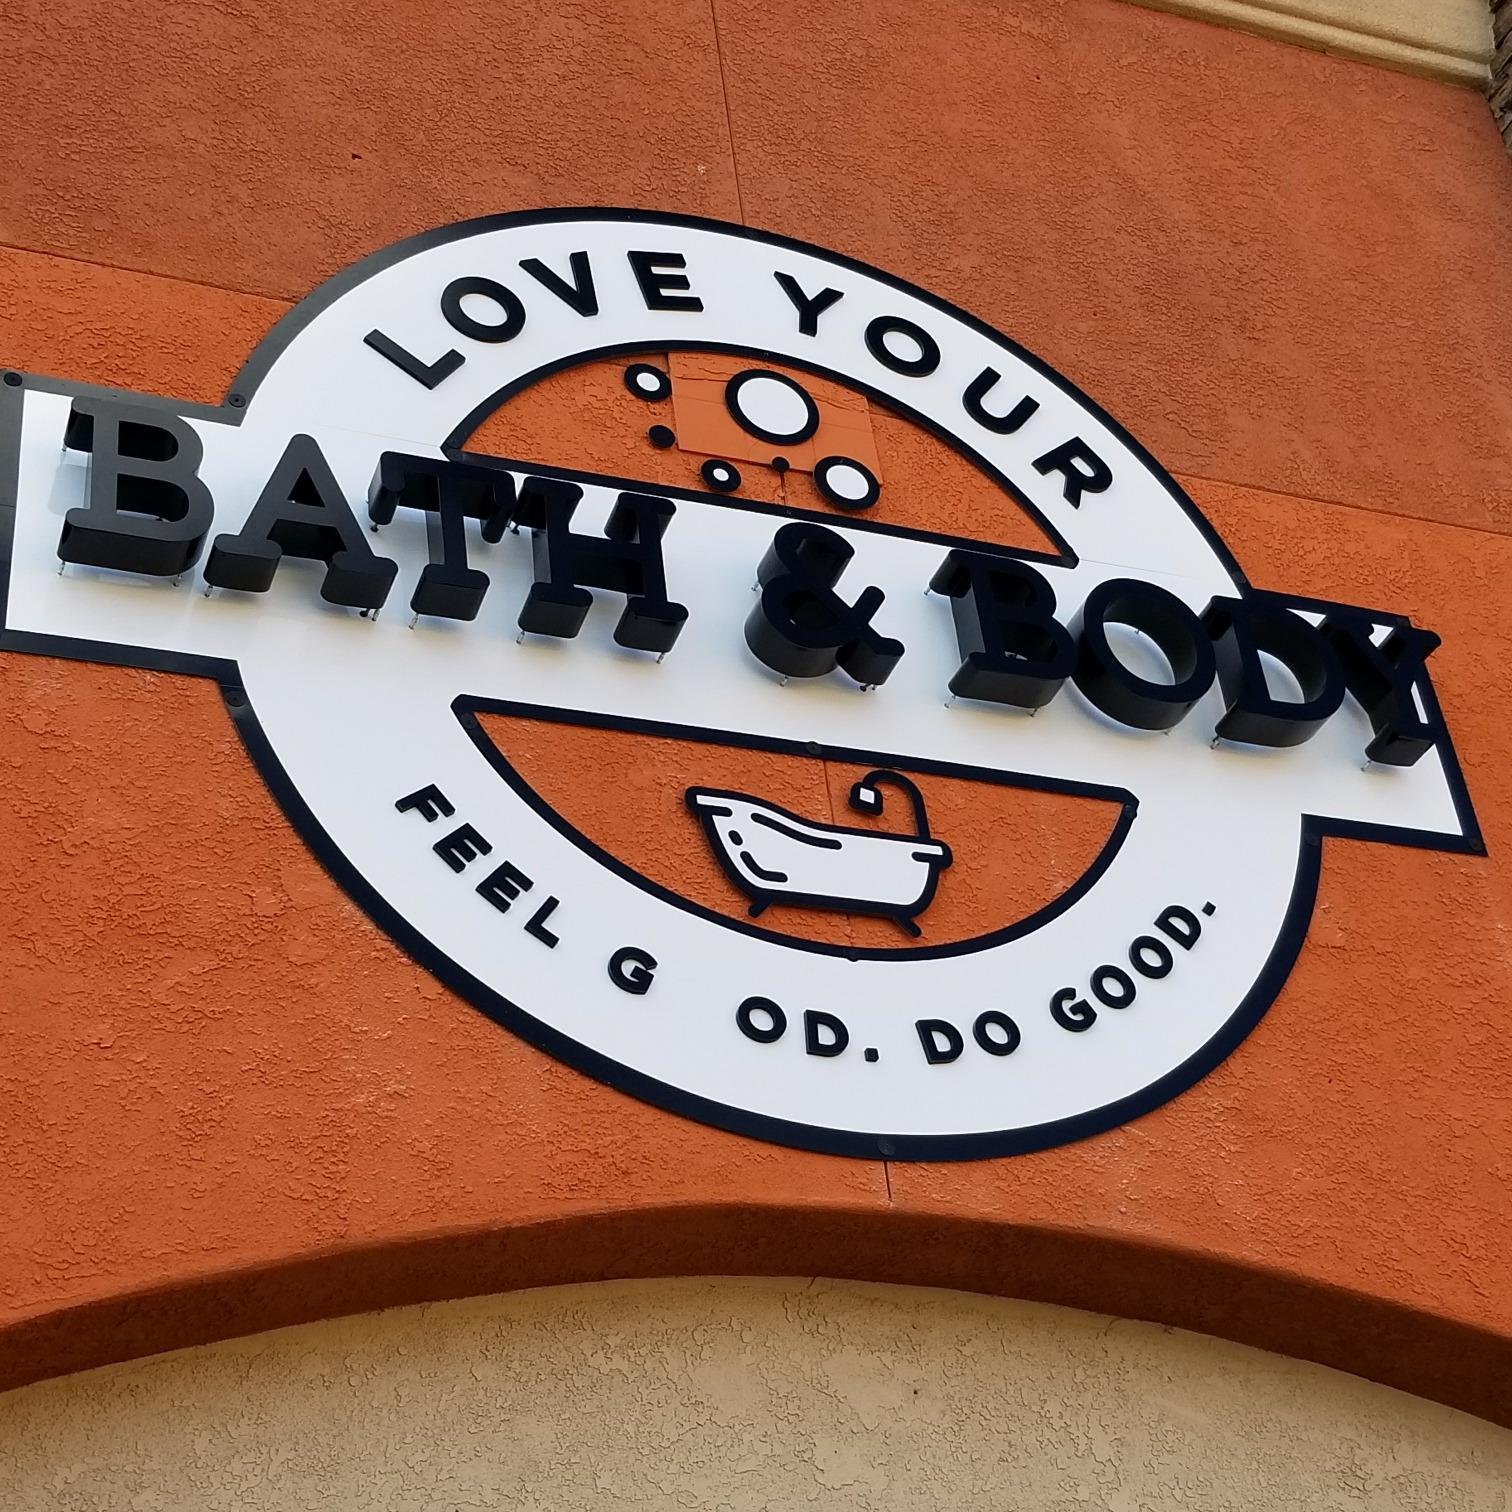 Love Your Body & Bath